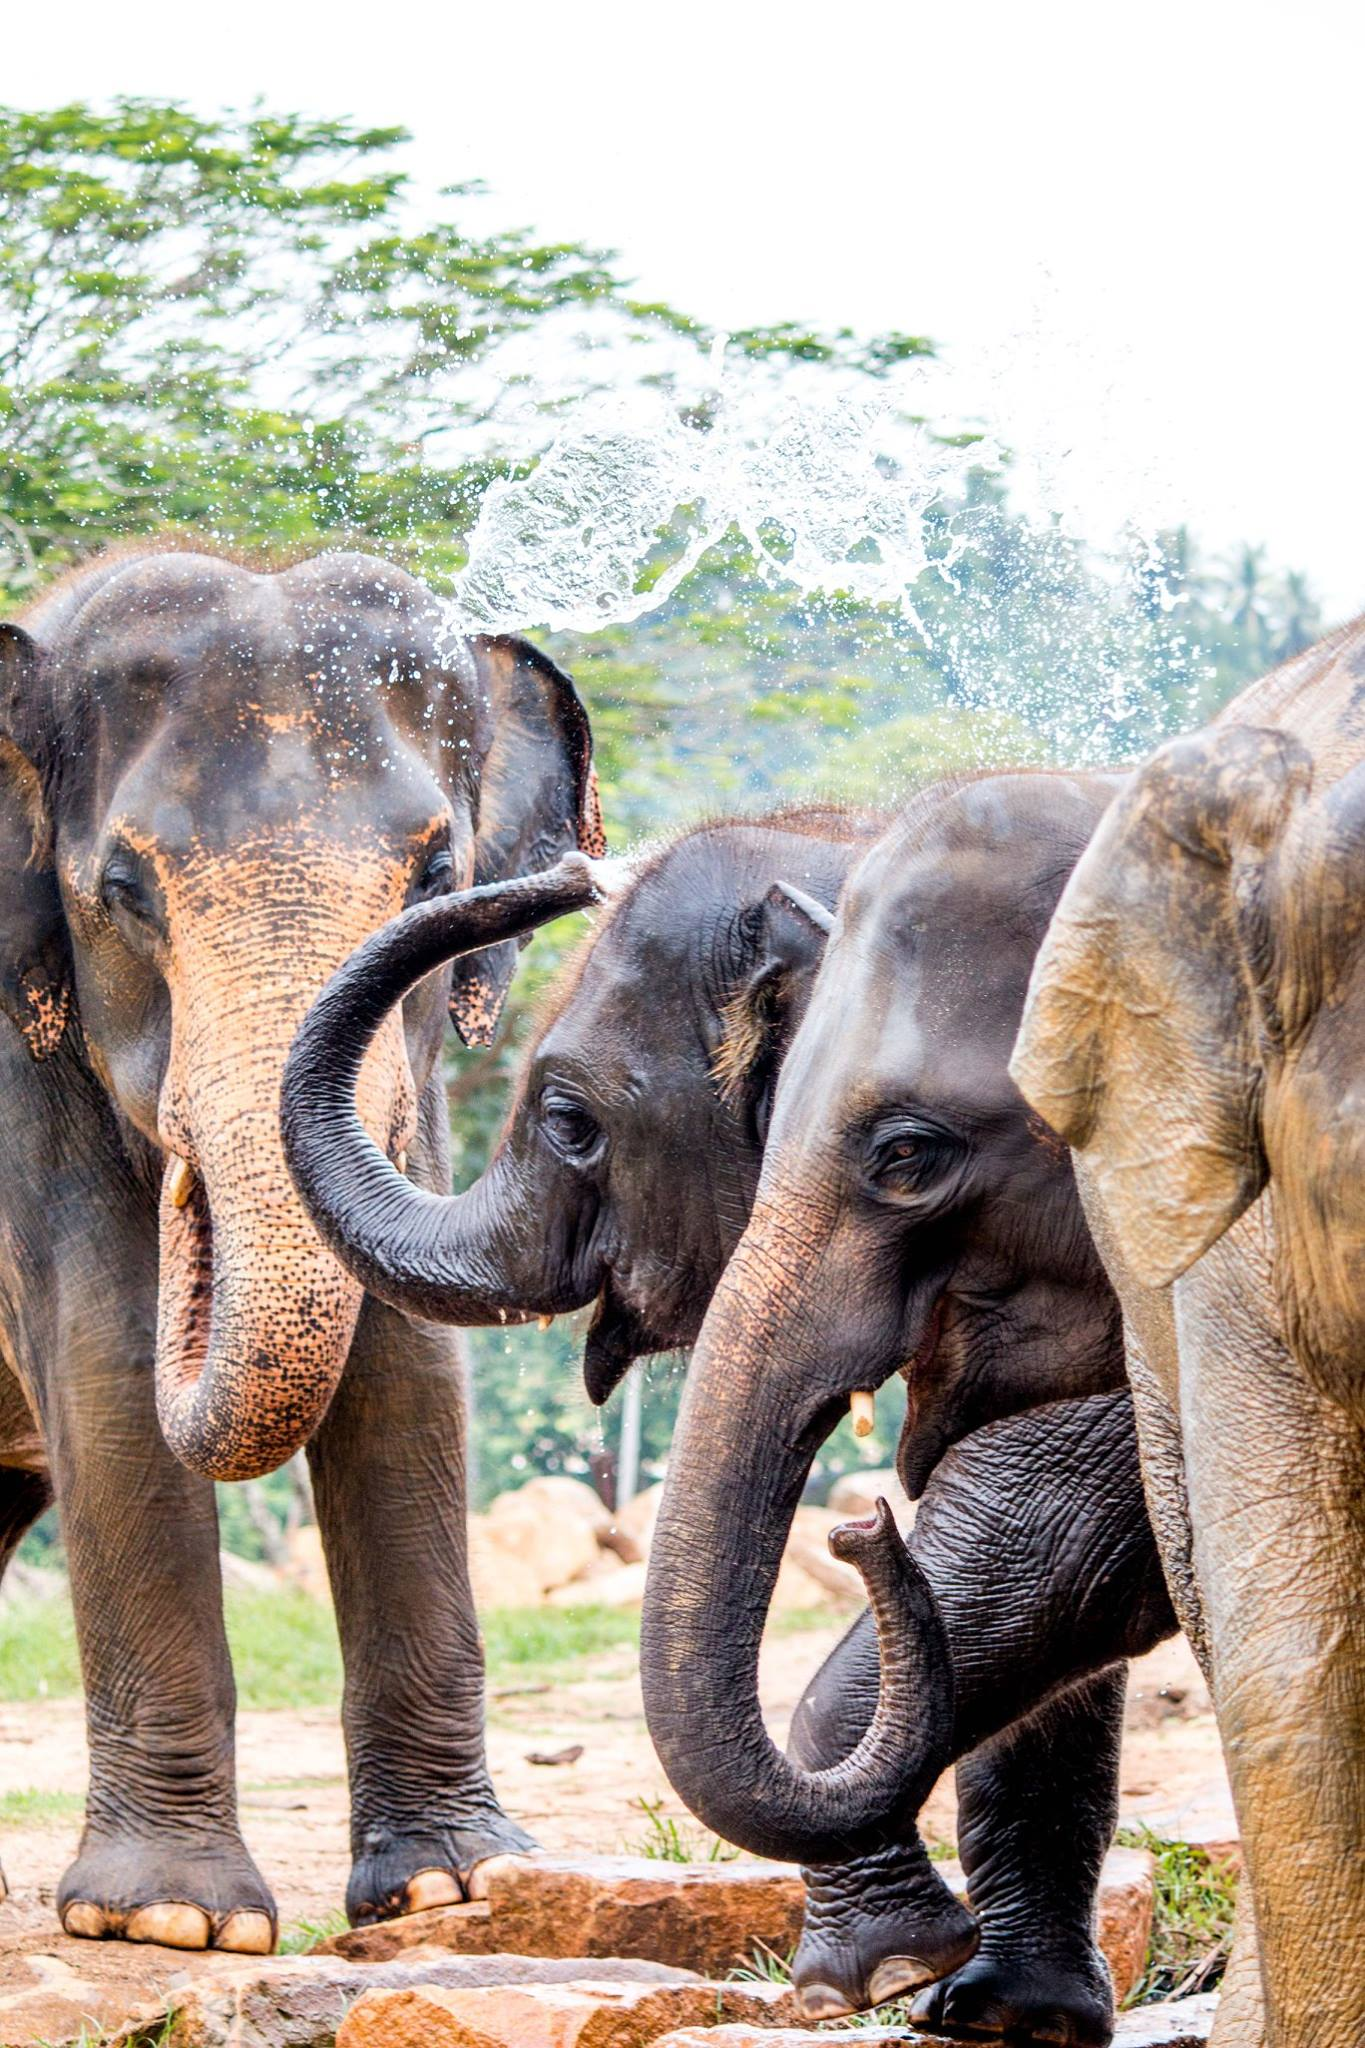 invite-to-paradise-sri-lanka-and-maldives-specialists-travel-agent-tour-operator-customer-review--feedback-joel-rhian-elephants-4.jpg